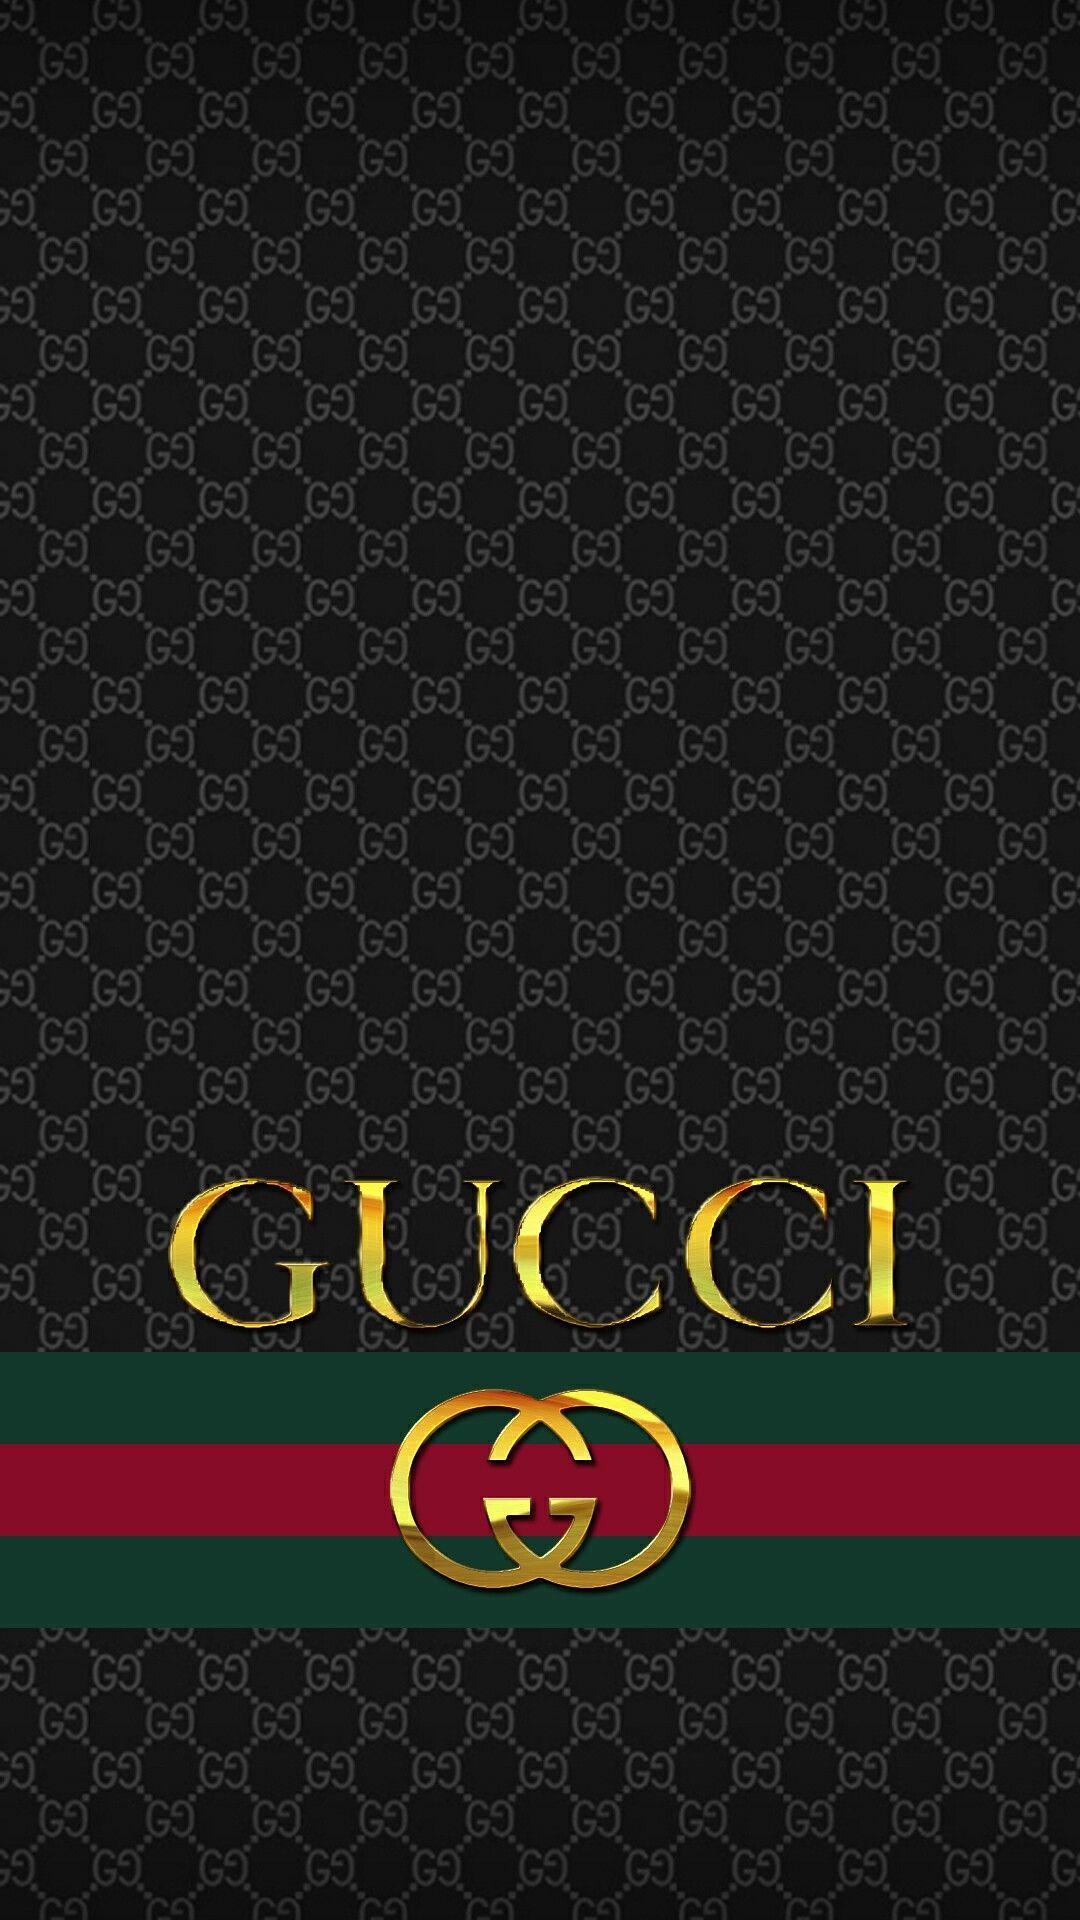 Supreme Gucci Wallpaper Iphone 1080x1920 Download Hd Wallpaper